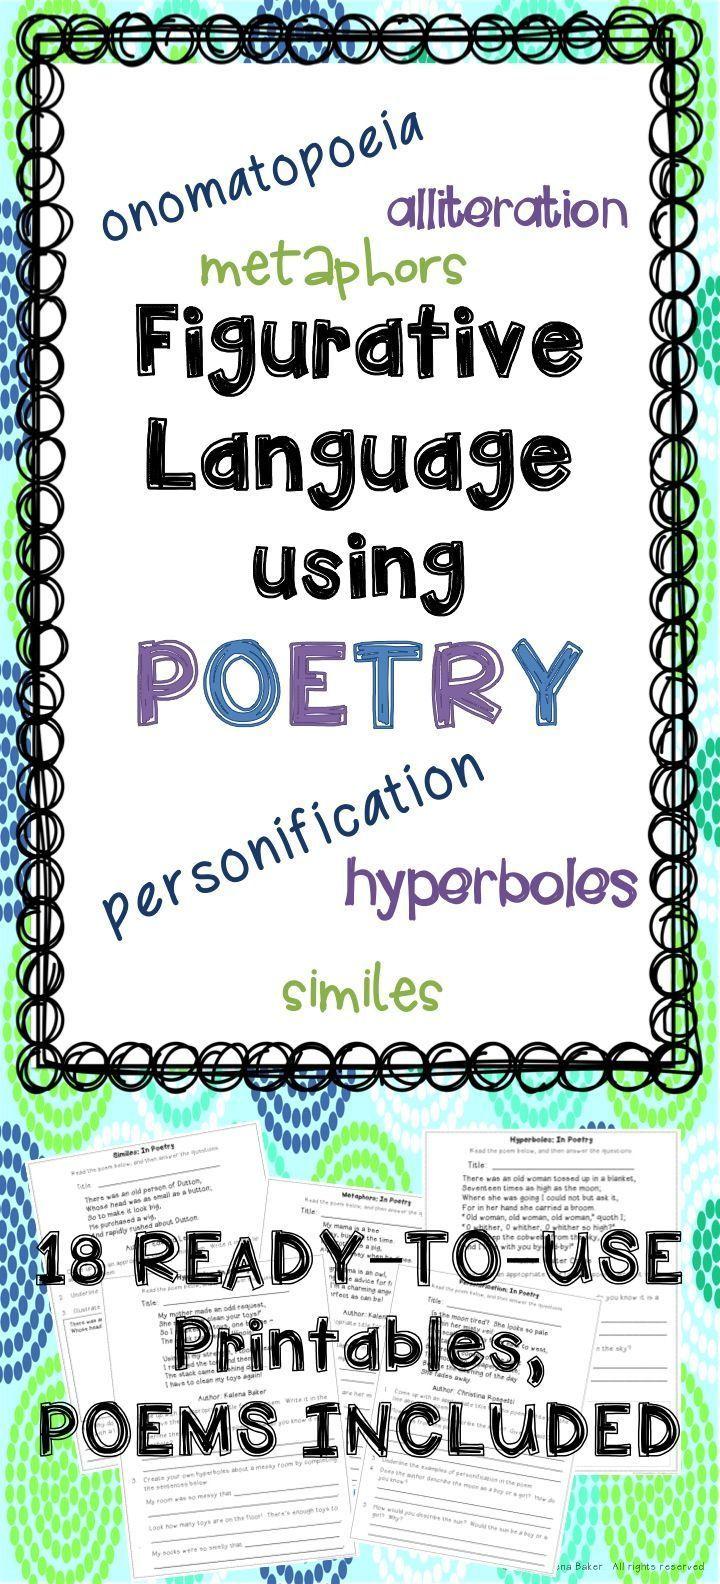 Language arts worksheets middle school